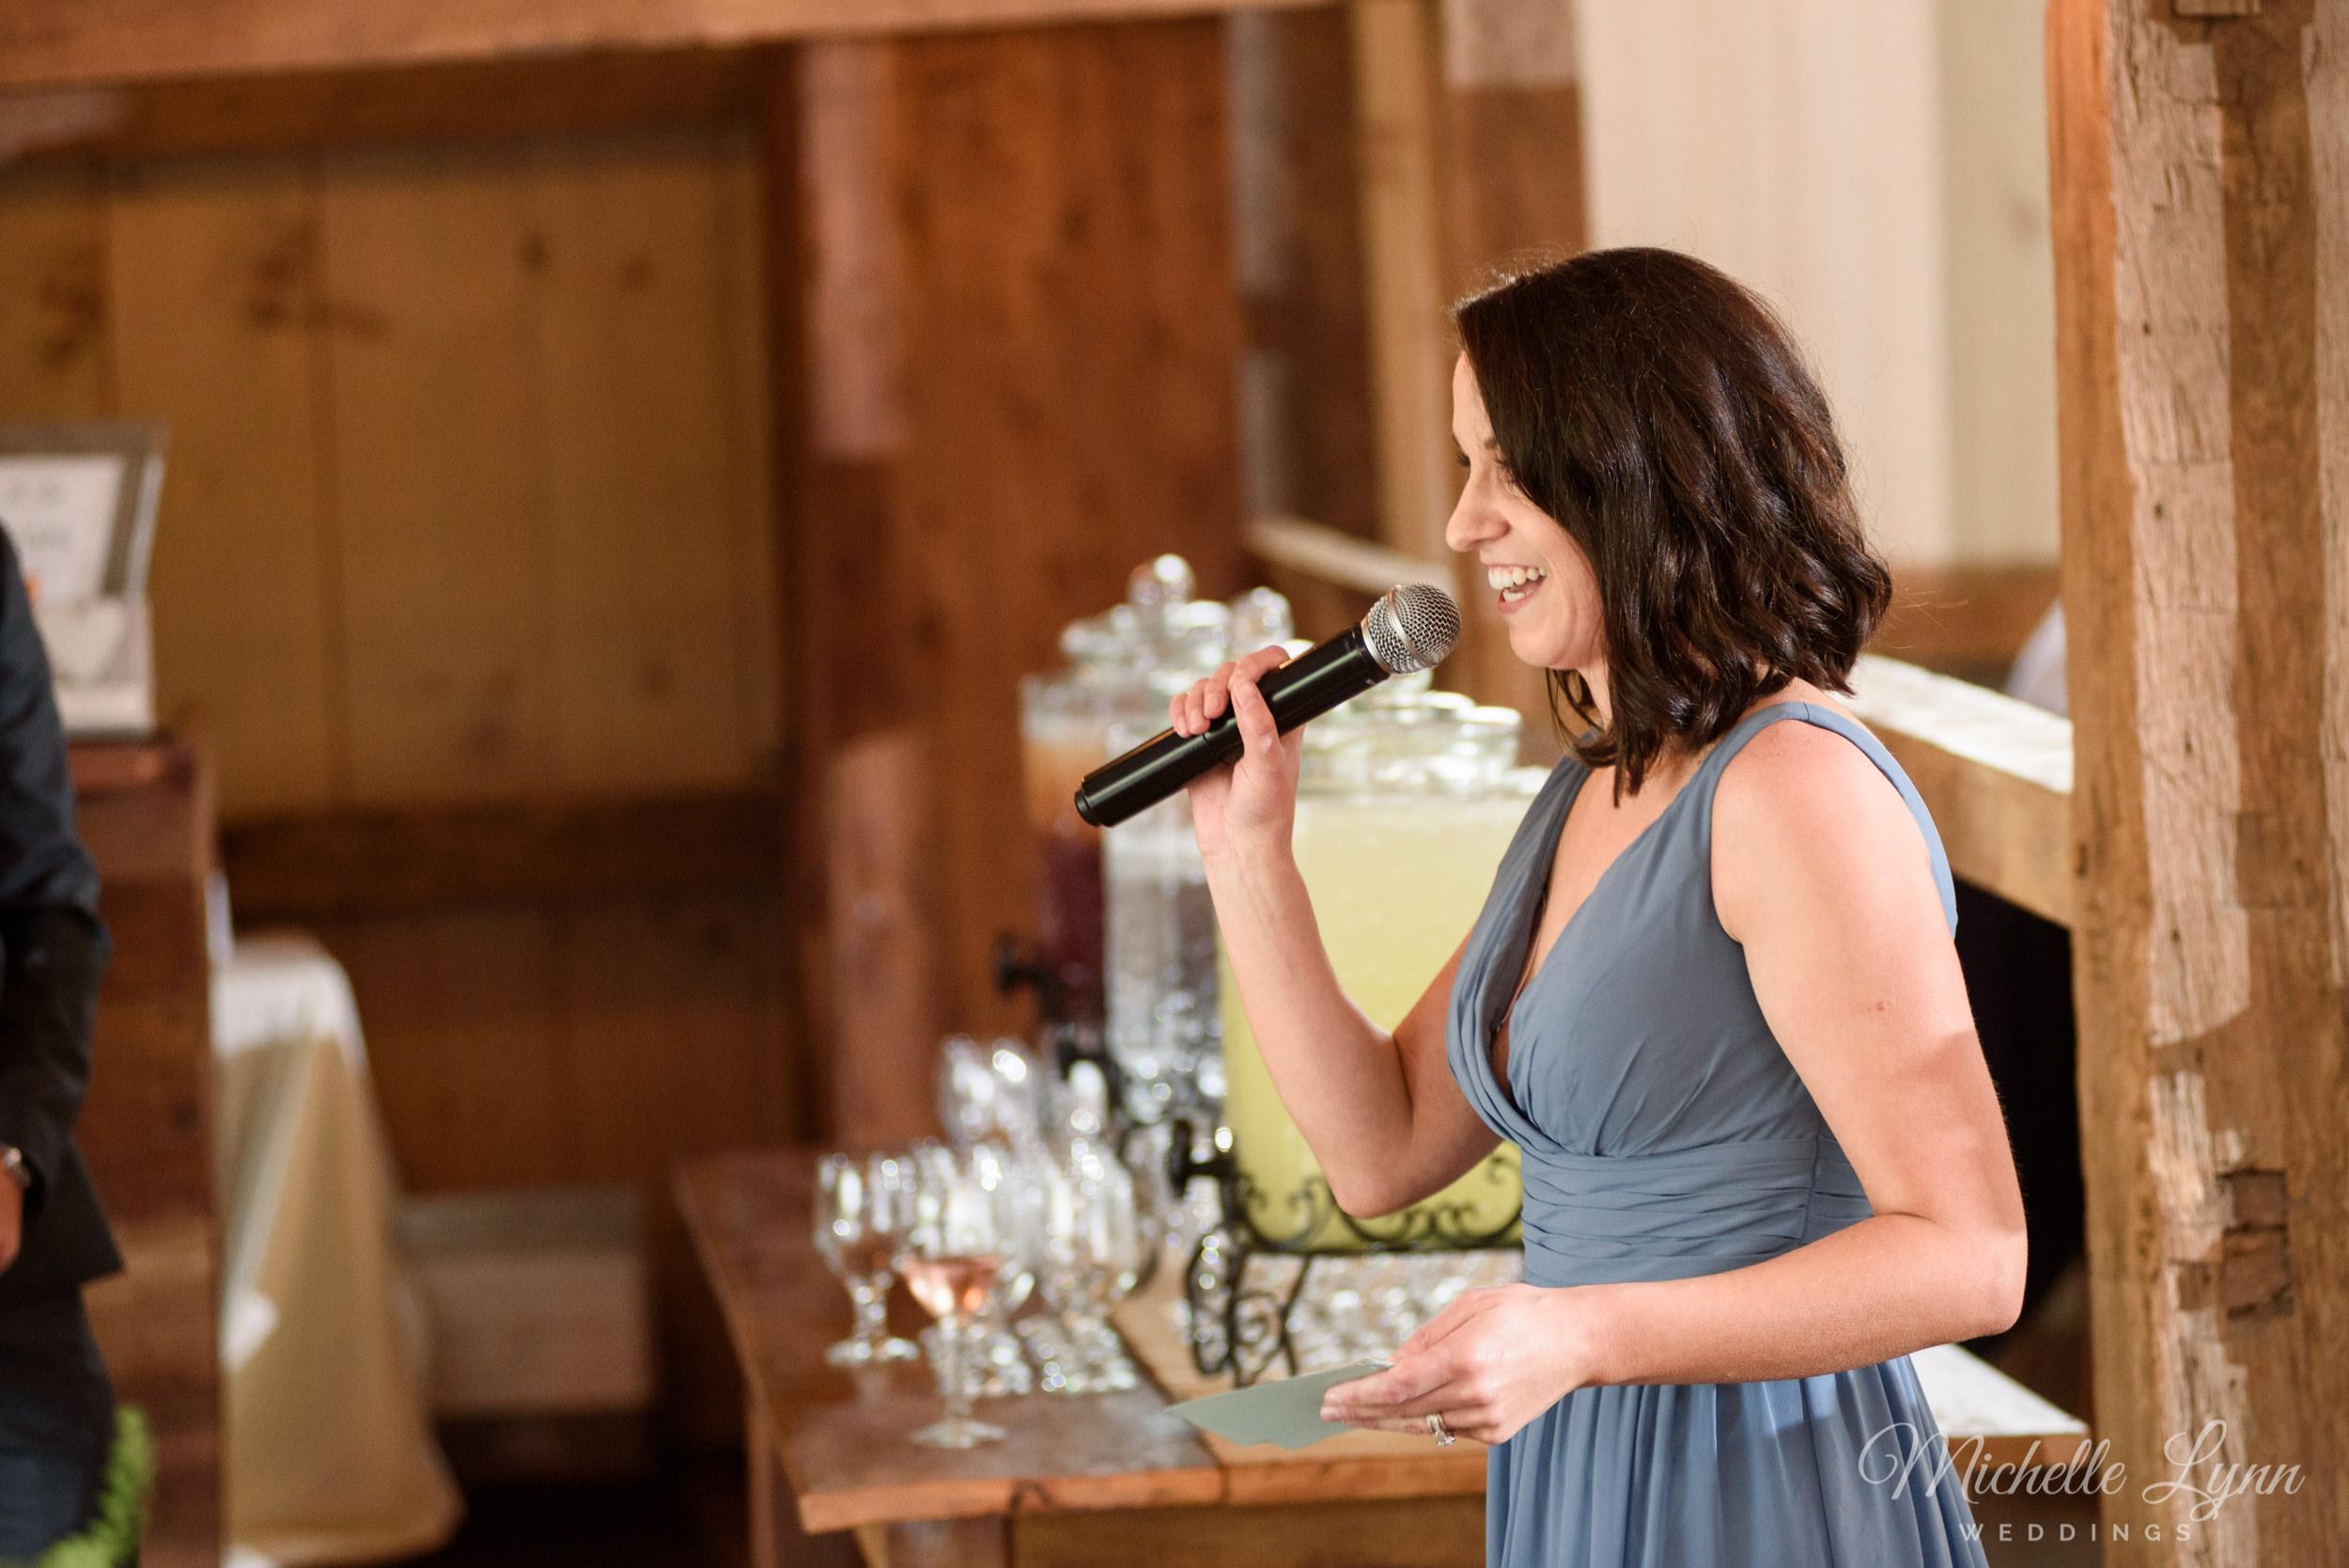 mlw-the-farm-bakery-and-events-wedding-photos-68.jpg